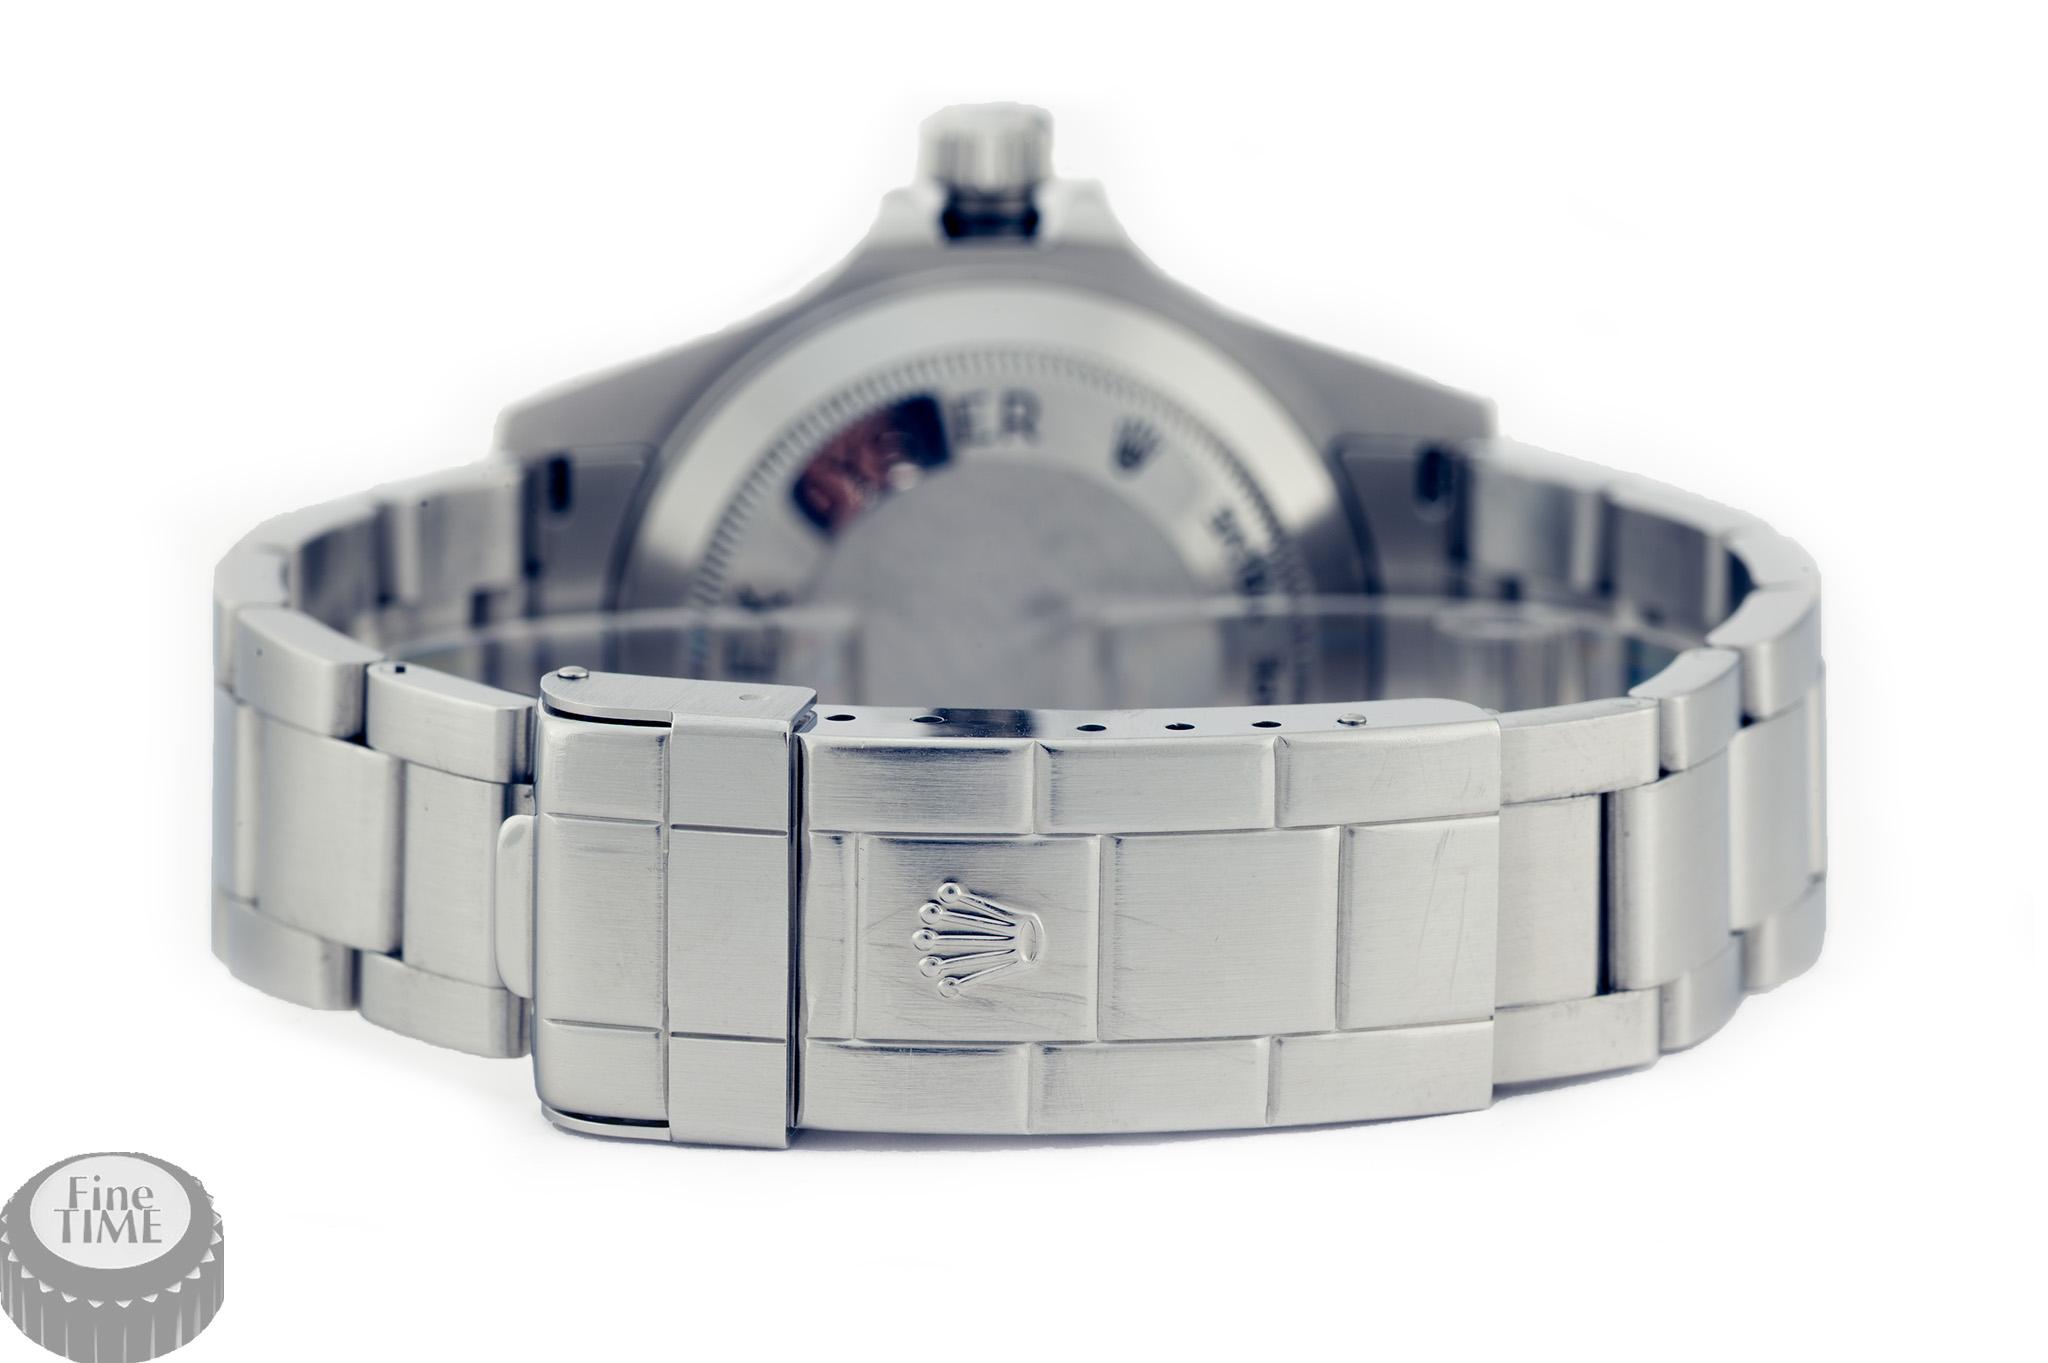 Rolex Seadweller 16600 F-serie clasp